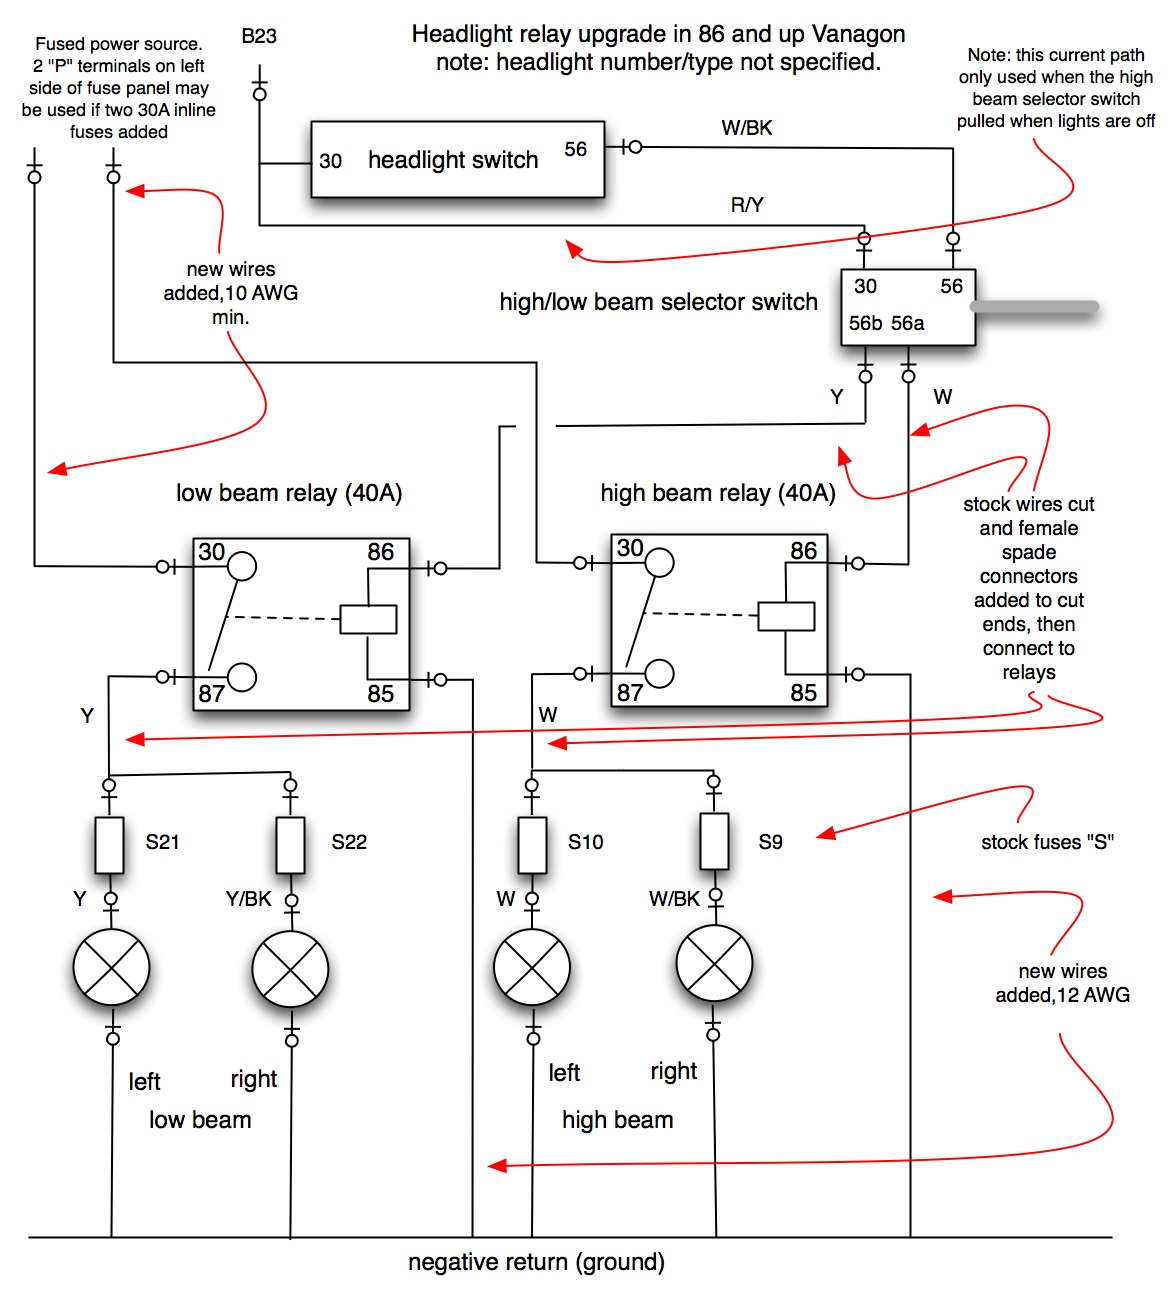 wolfsburg vw engine tin diagram 14 26 kenmo lp de \u2022wolfsburg vw engine tin diagram wiring library rh 20 ggve nl vw beetle engine tin diagram